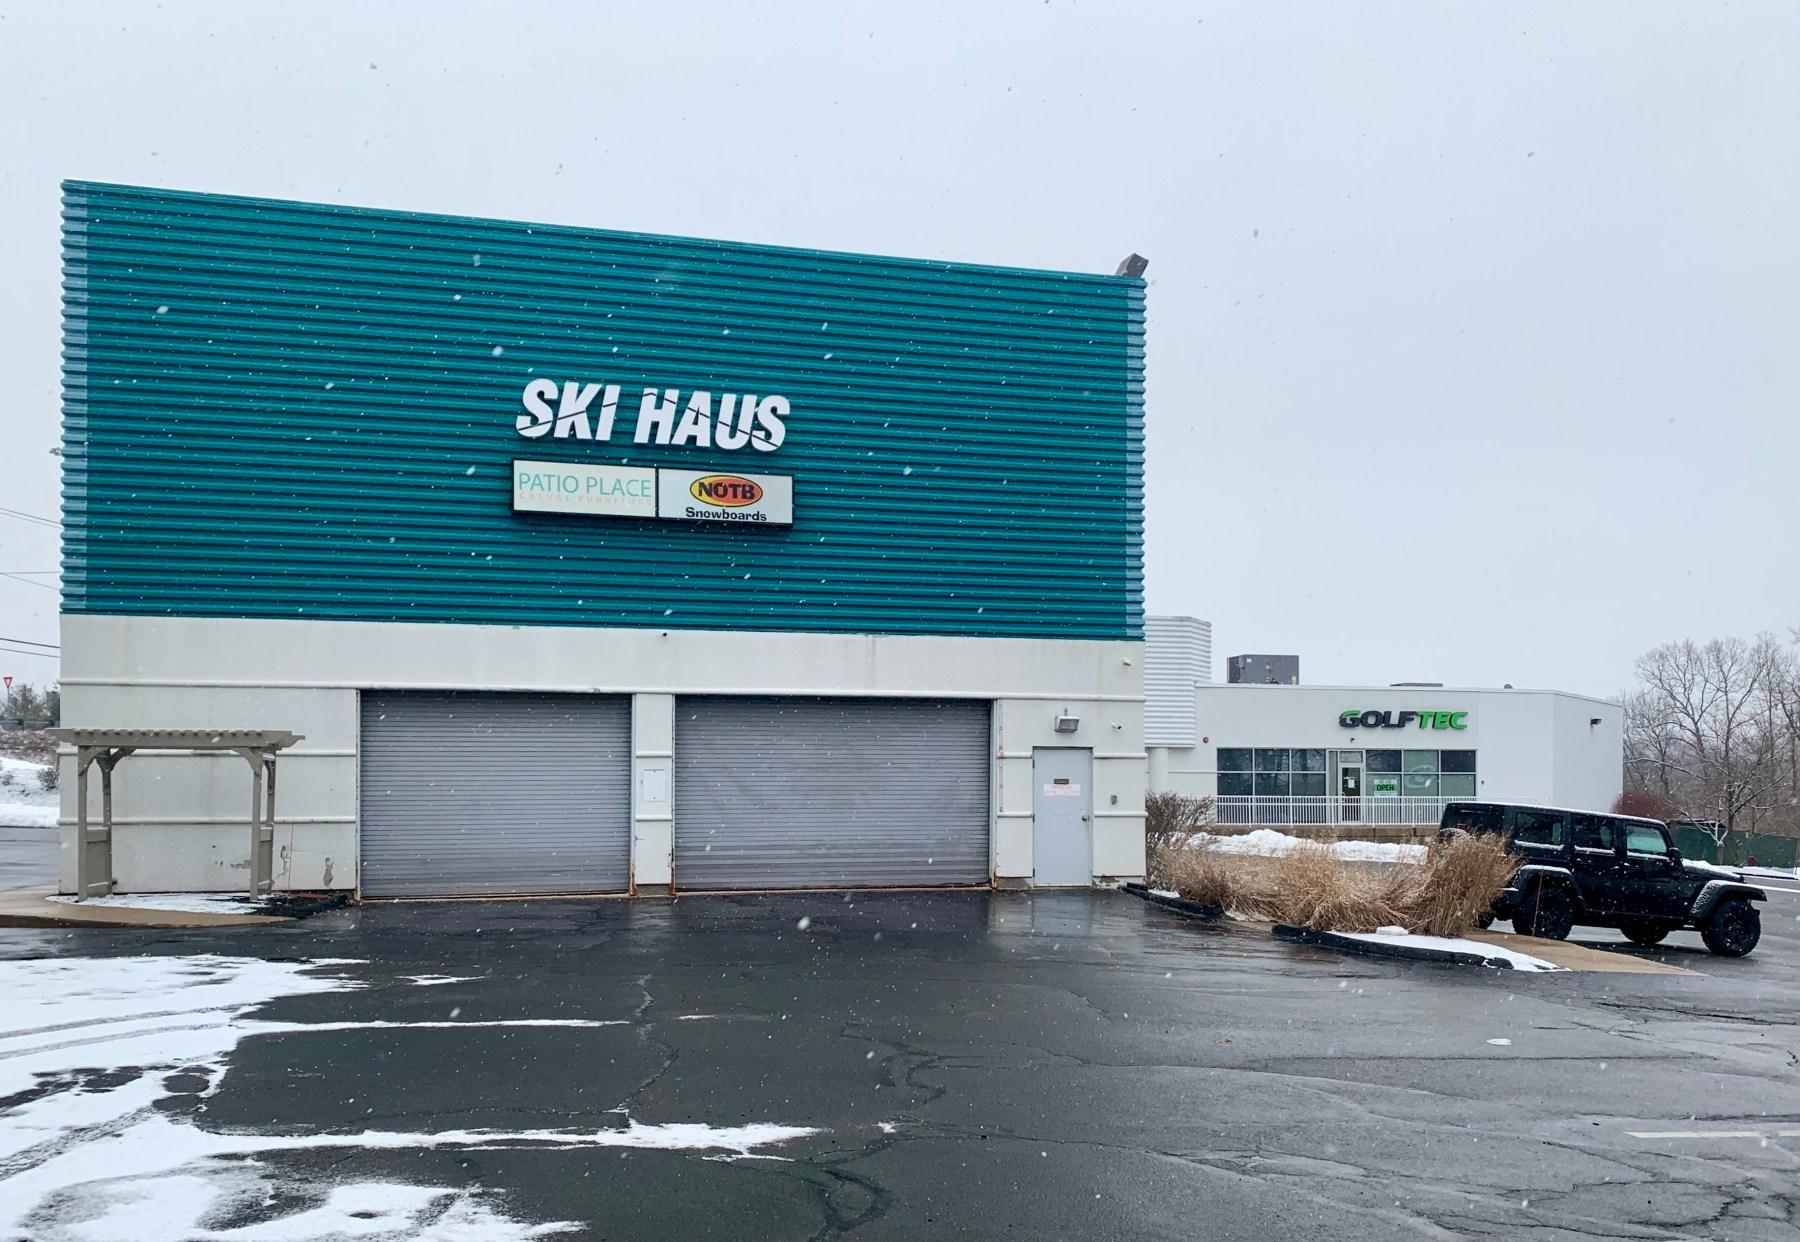 Ski Haus and GolfTec, 1 Wheeler Road, Burlington, MA